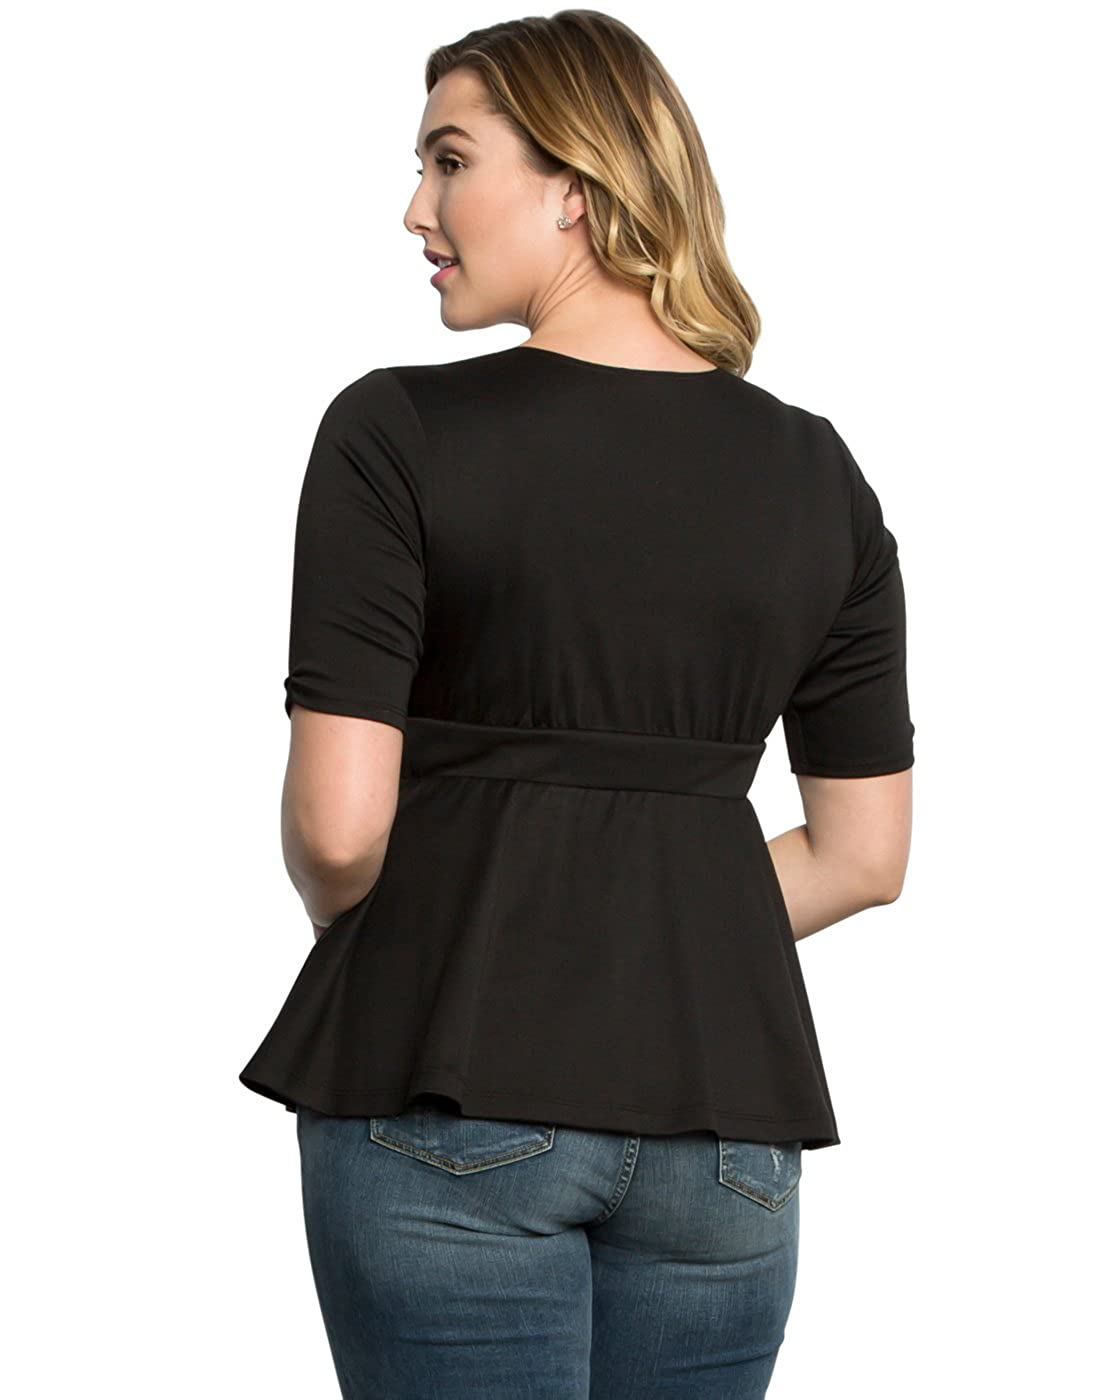 ad564f9077f Kiyonna Women s Plus Size Posh Ponte Peplum Top at Amazon Women s Clothing  store  Fashion T Shirts